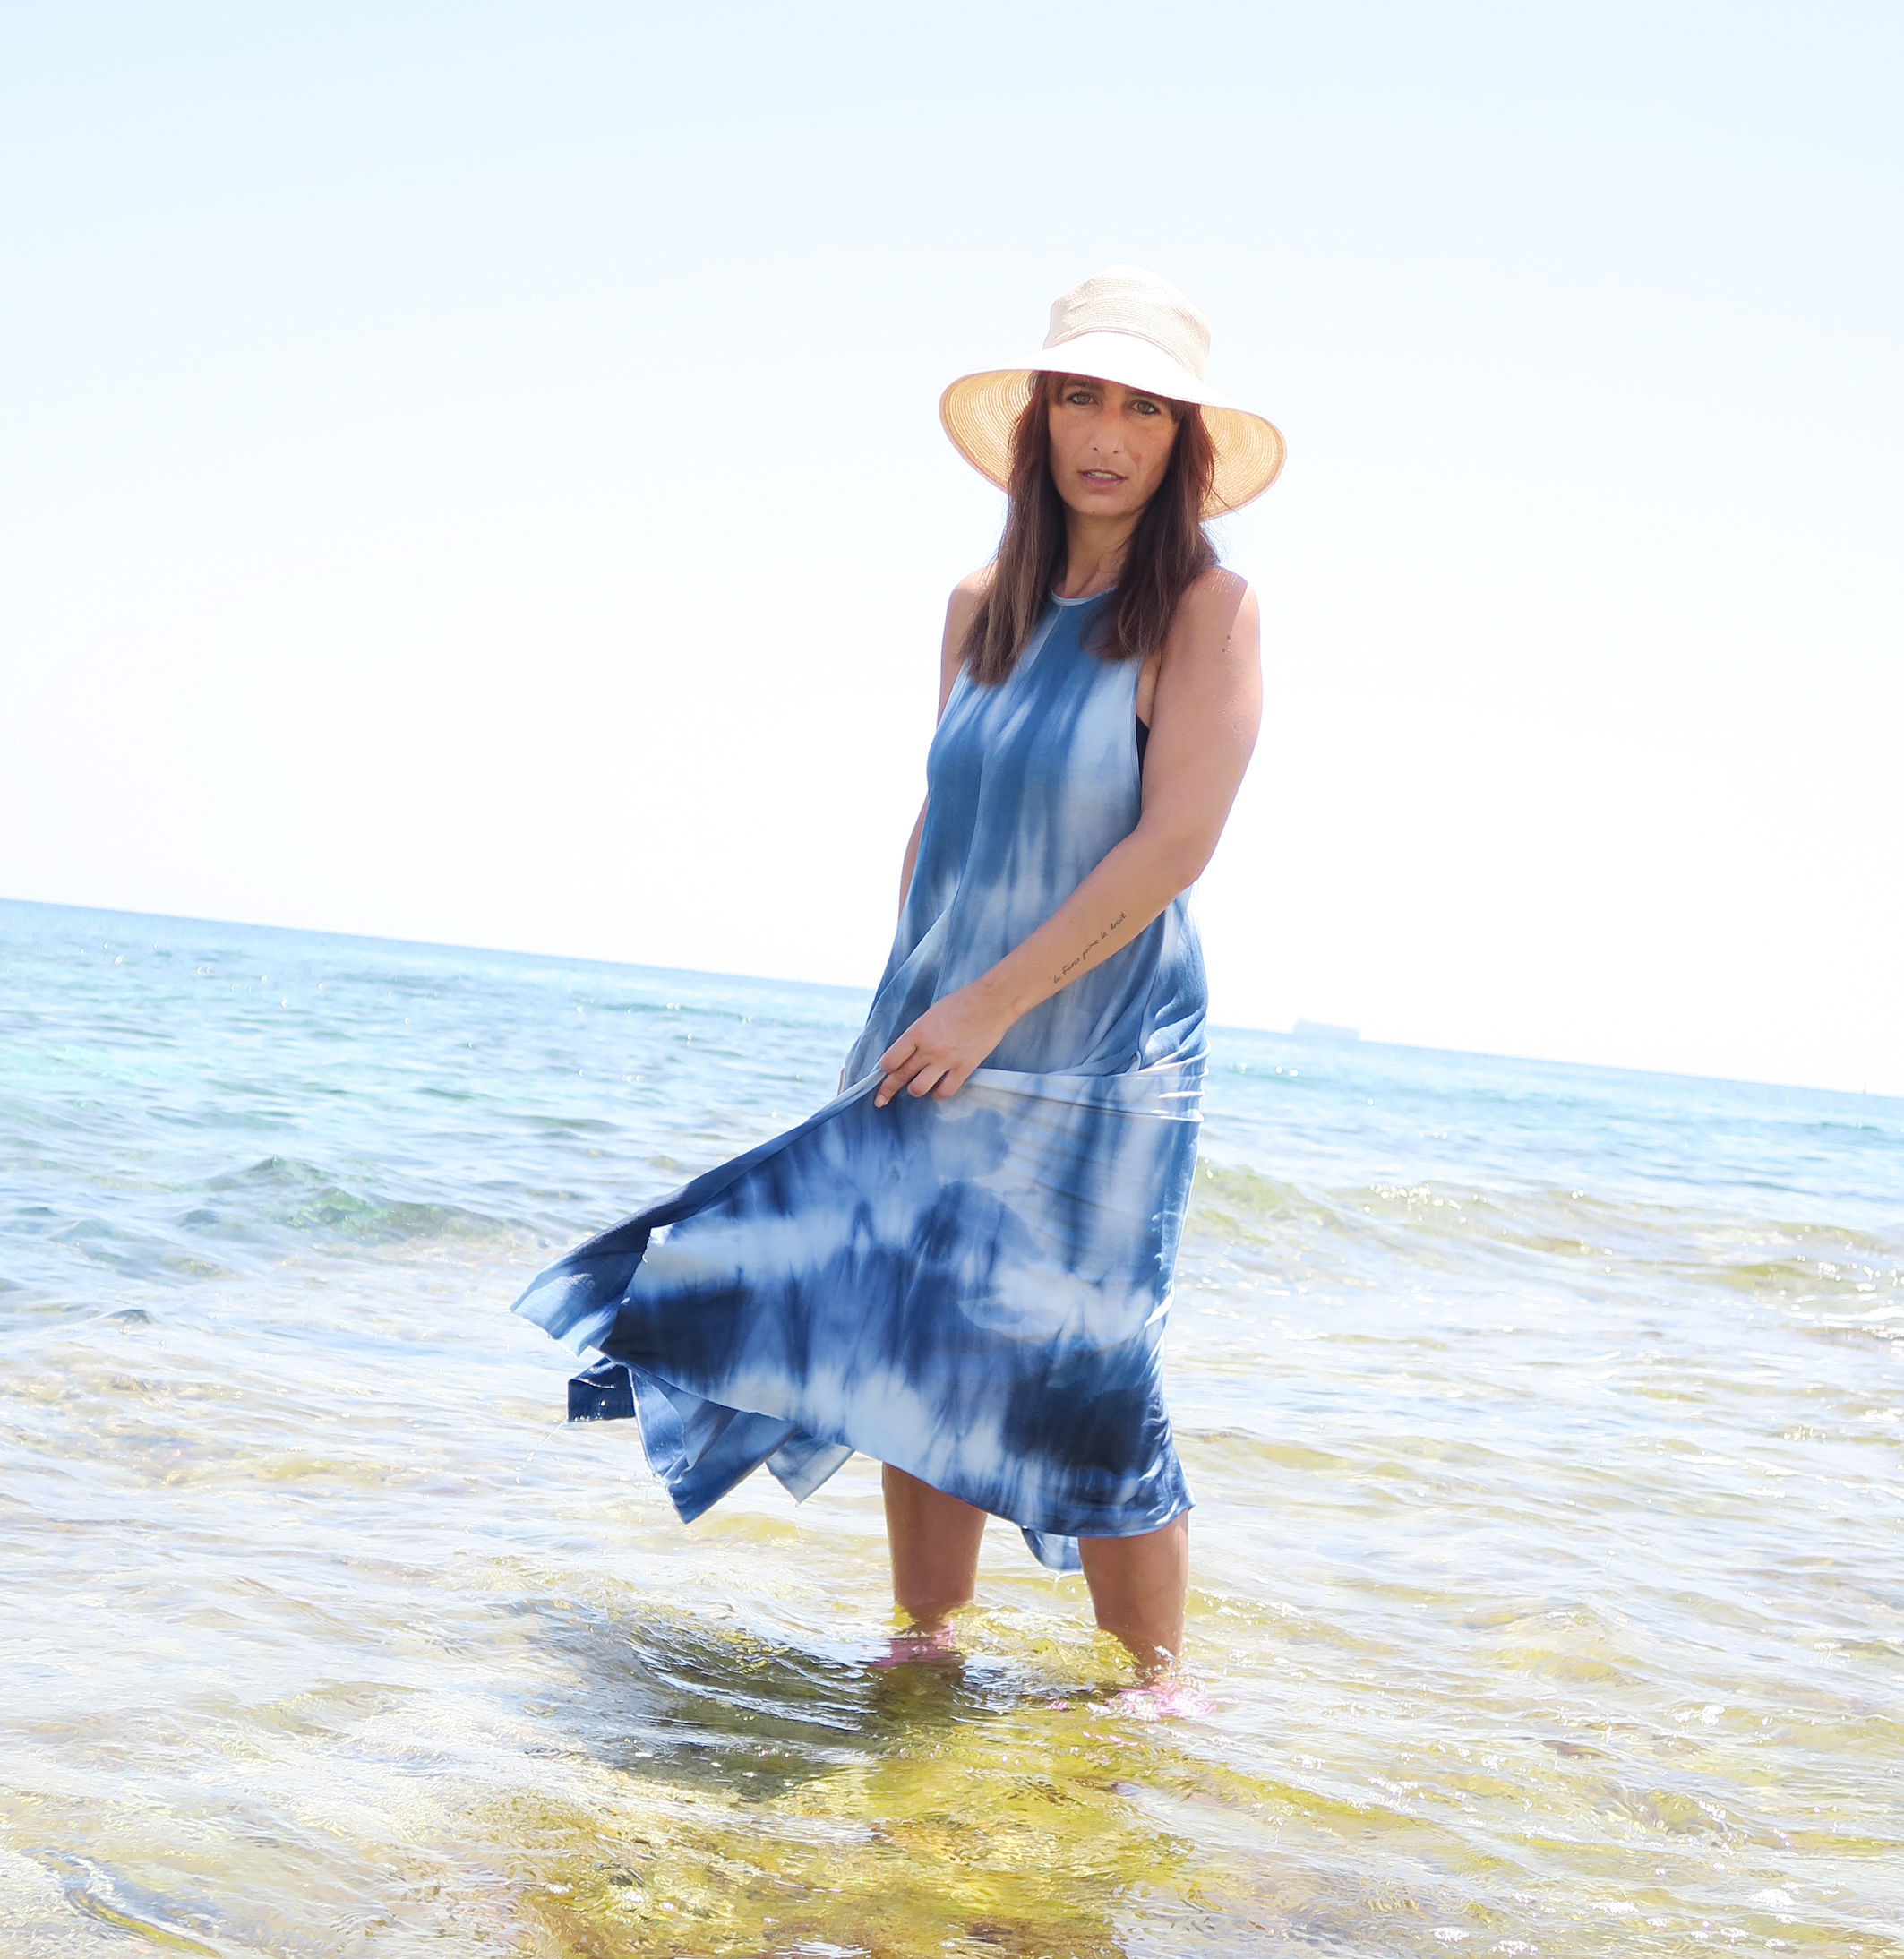 Malta-Blogger-Streetstyle-Fashion-Modeblogger-Fashionblogger-7